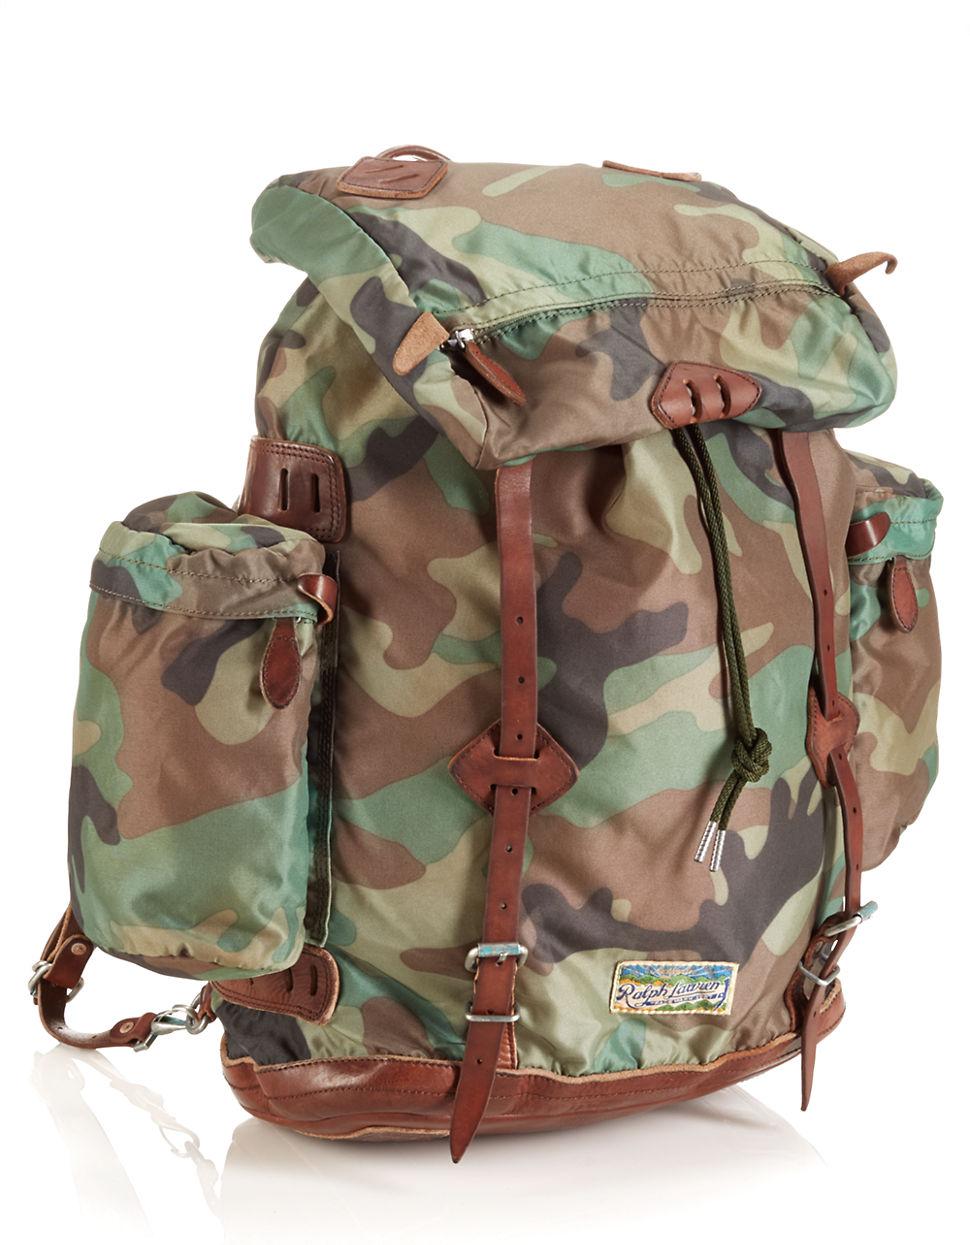 c655de8d090a Ralph Lauren Camouflage Bag